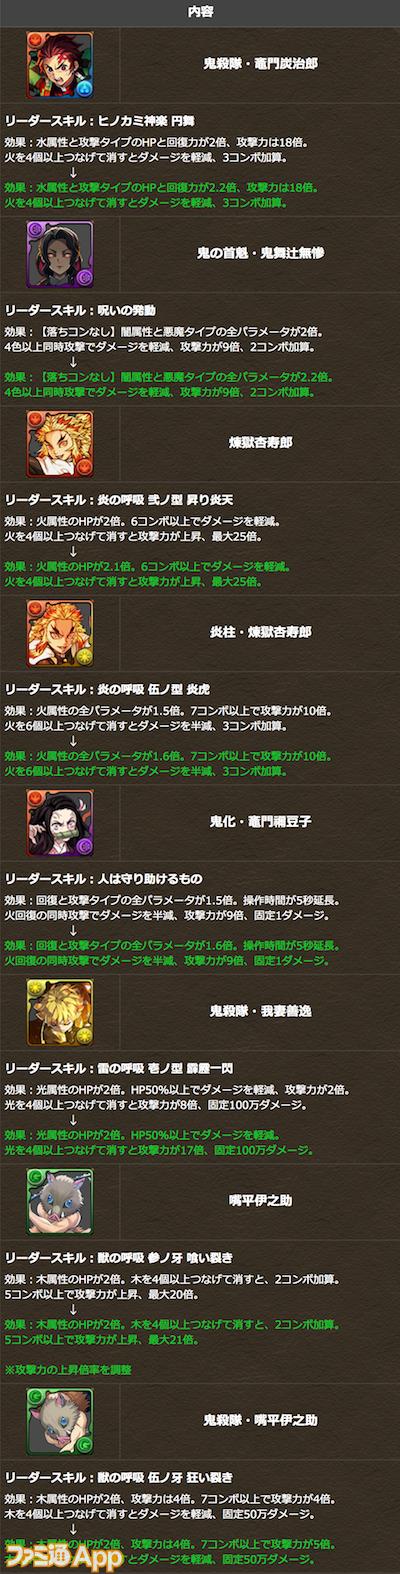 screencapture-pad-gungho-jp-member-collabo-kimetsu-210513-adjust-html-2021-05-13-19_09_51